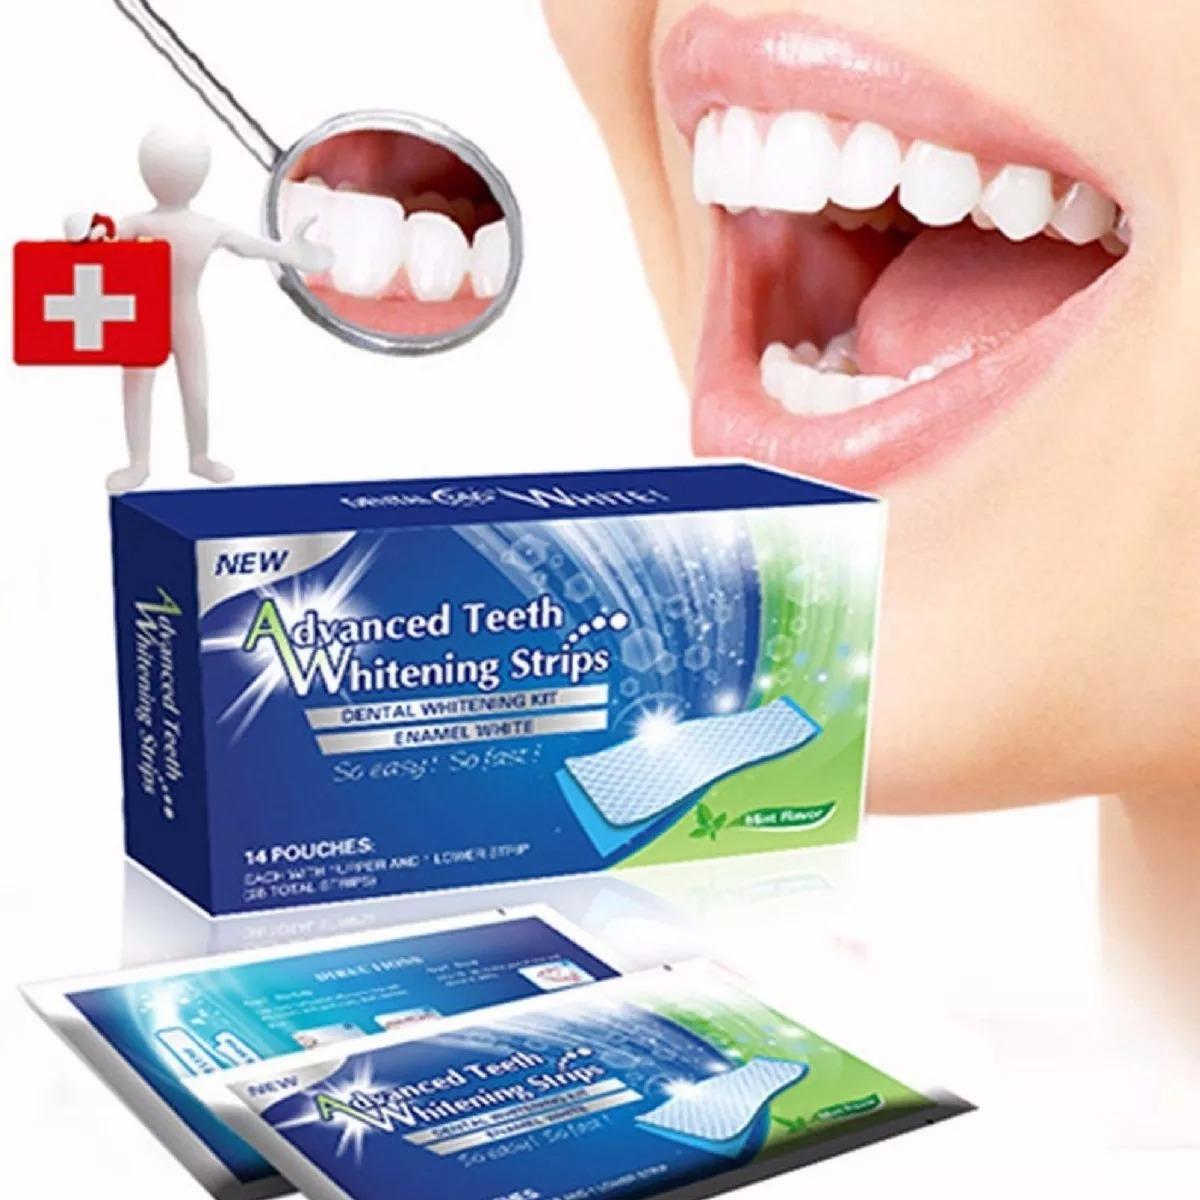 Clareamento Dental Profissional Fita De Gel Adesiva Mint R 42 90